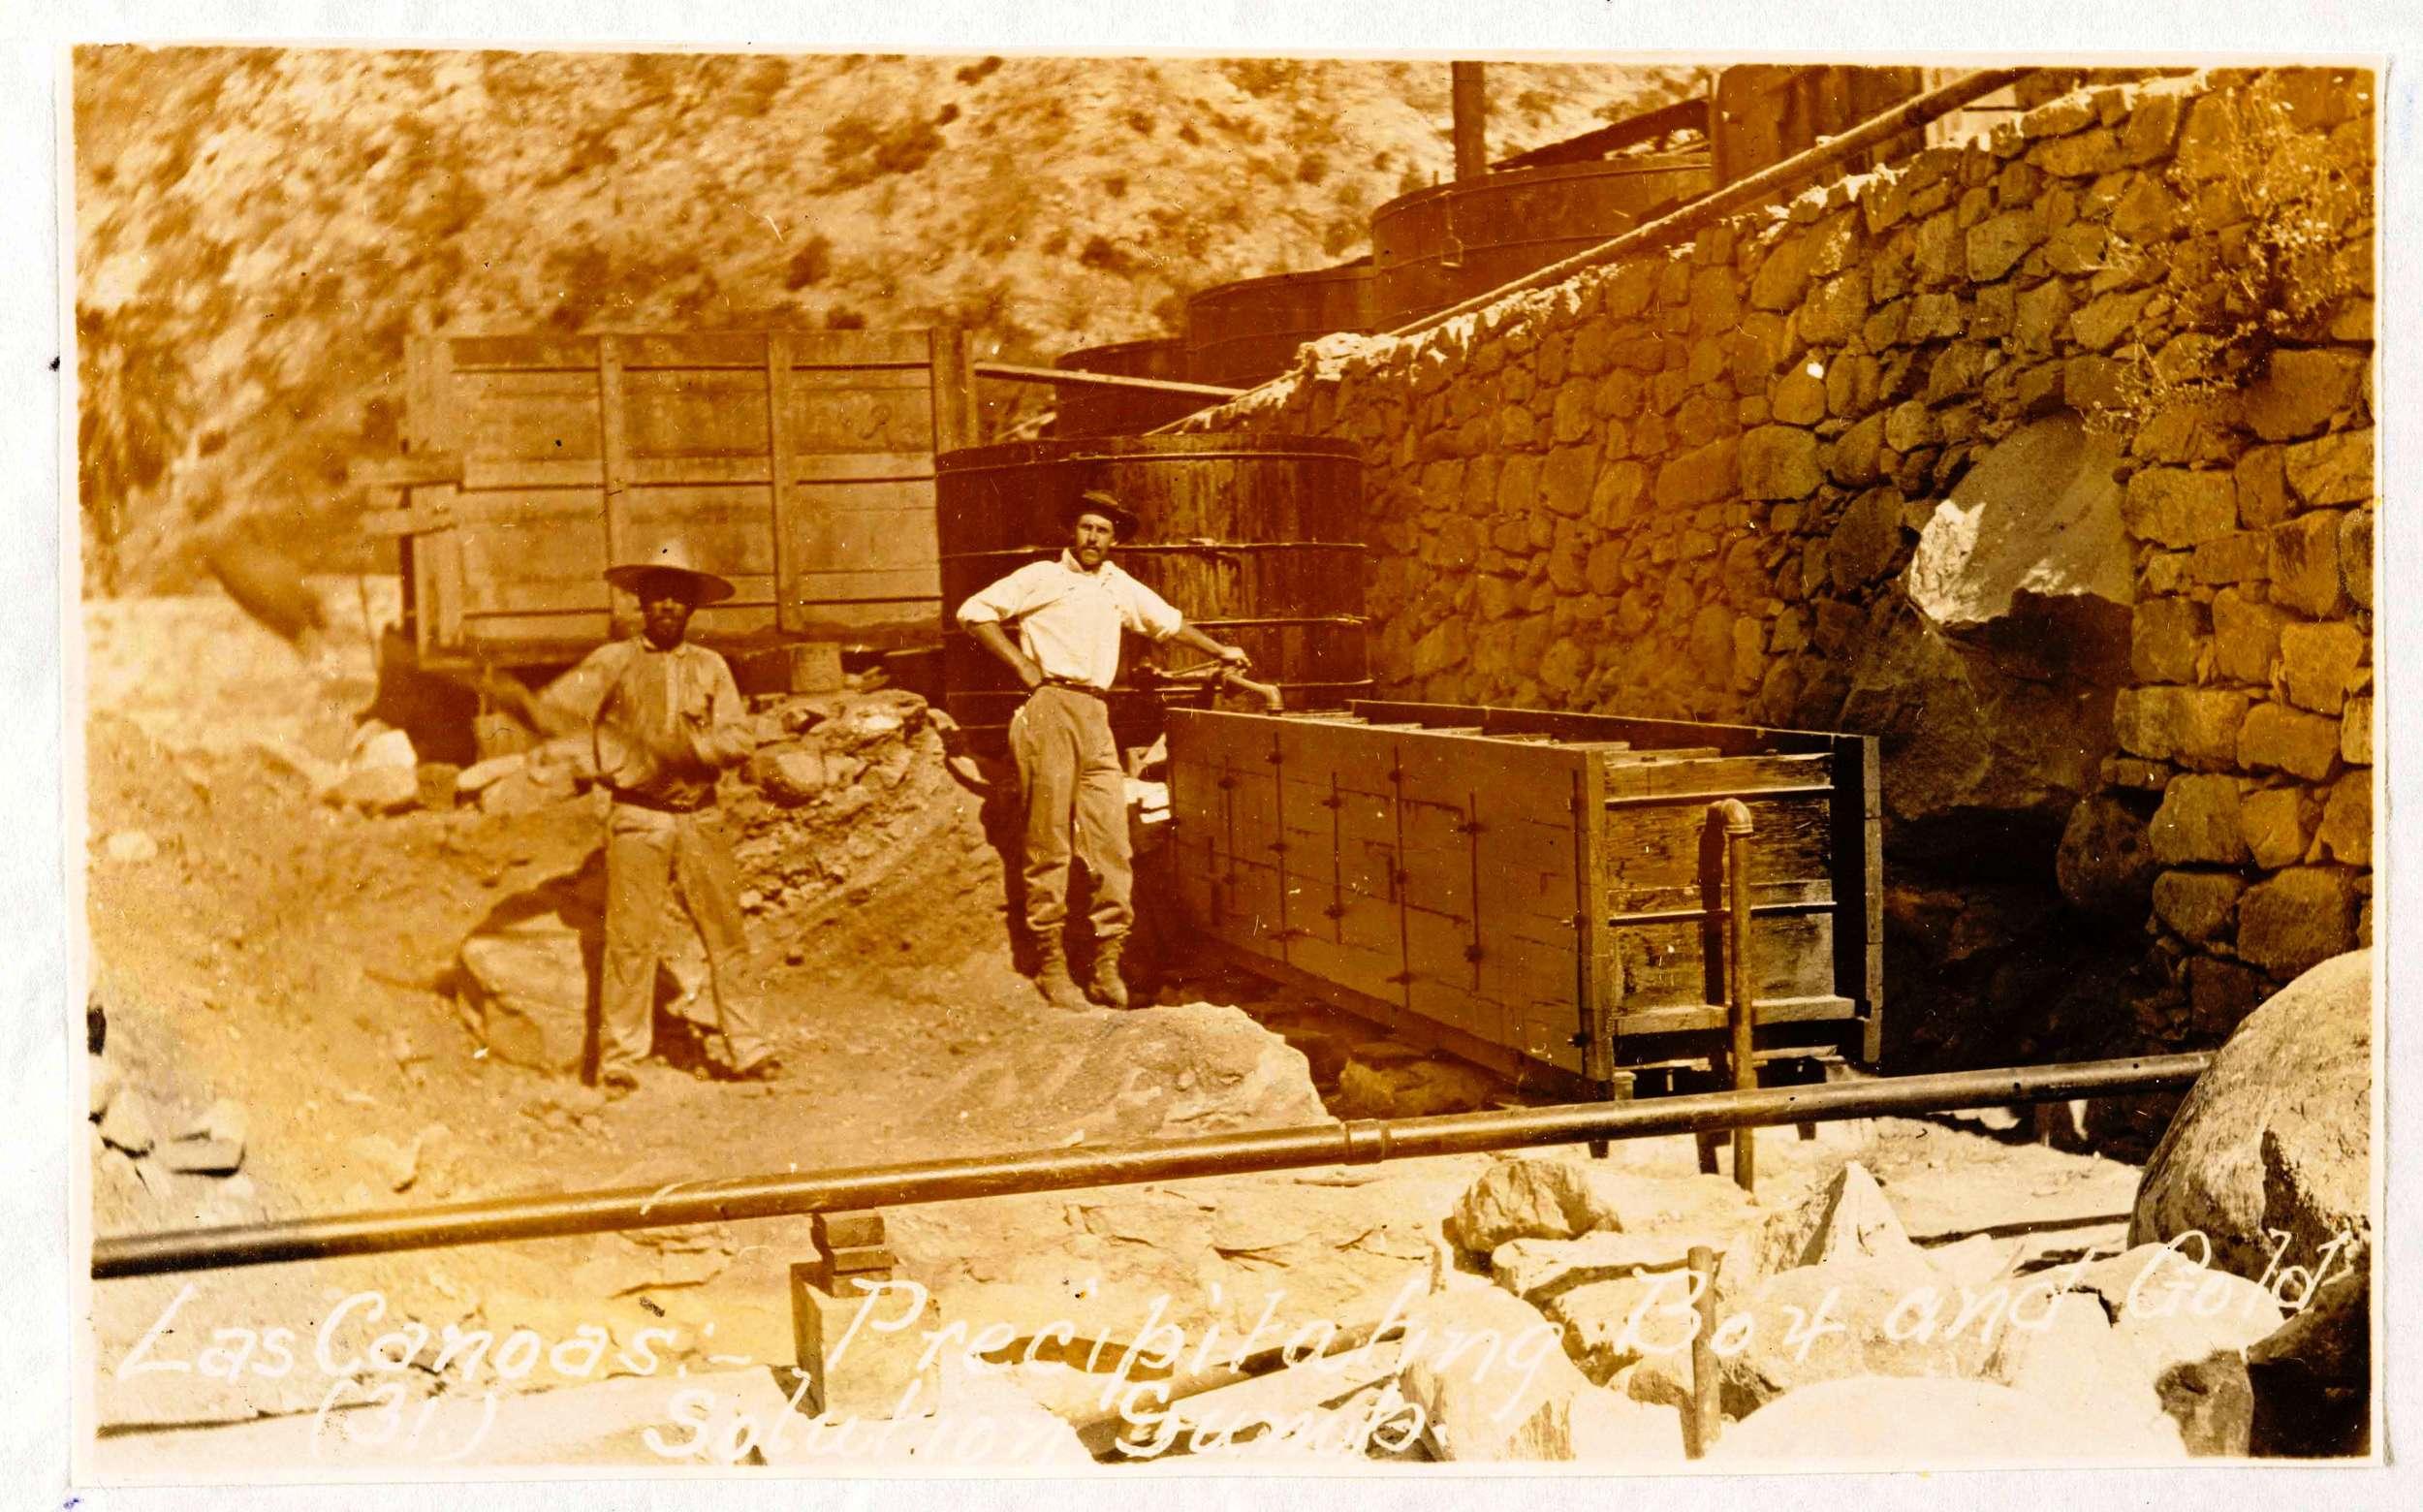 Sierra Cacachilas miners more than a century ago. *